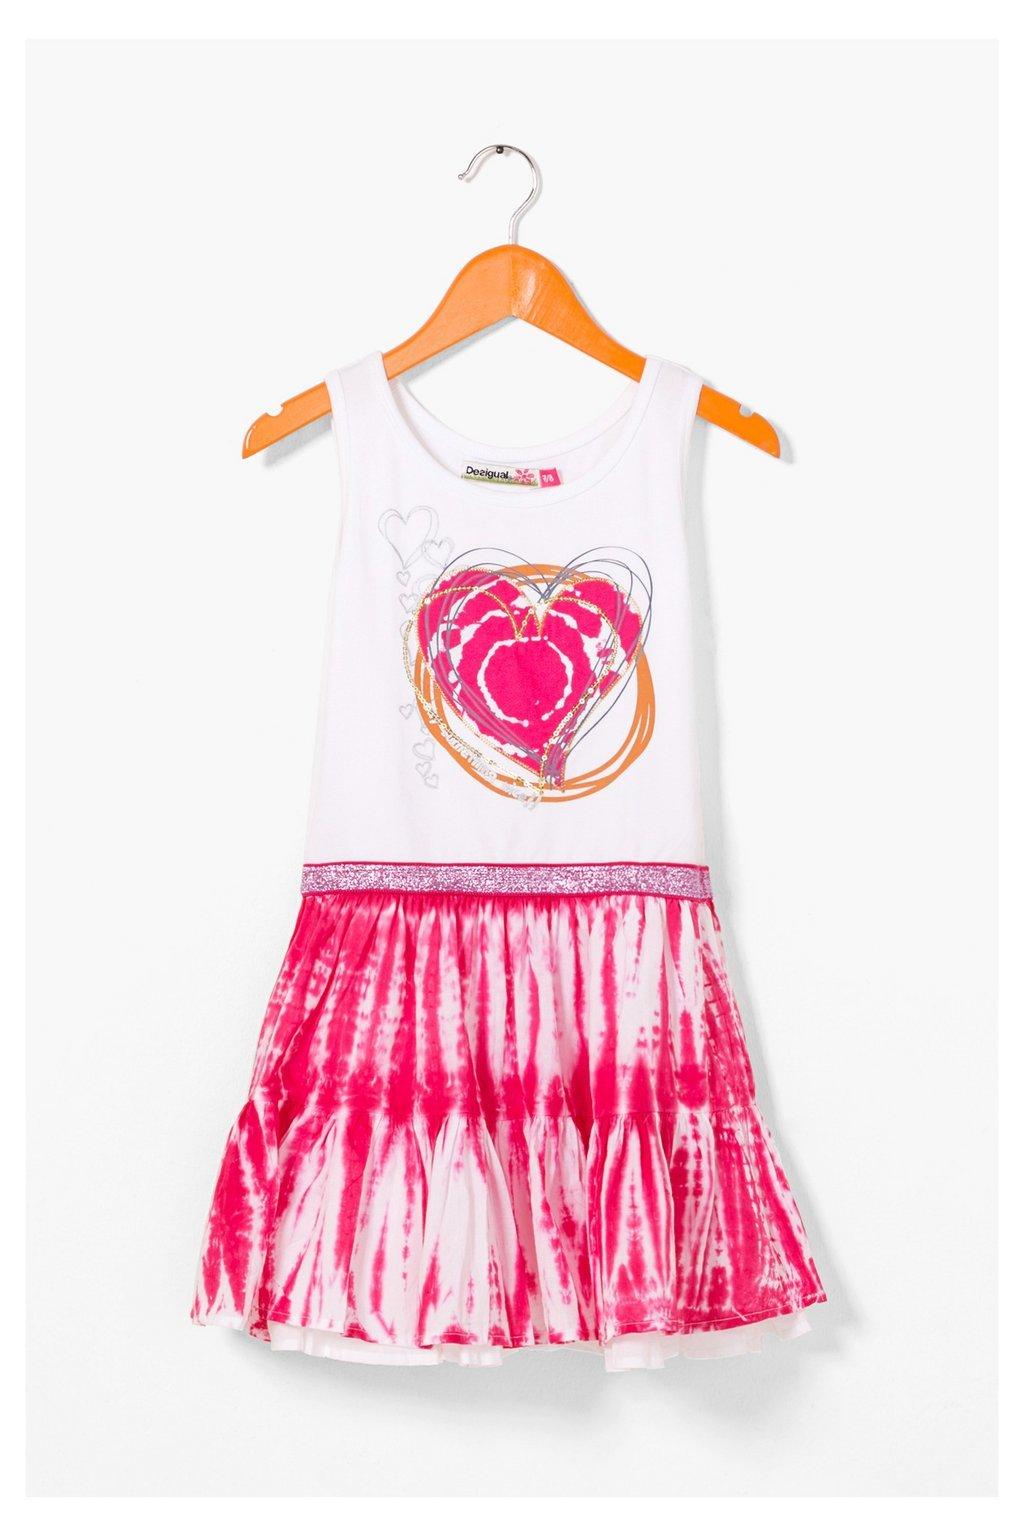 e9707eb2f870ce Bergua Jurken – Kinderkleding Bestellen Online Bij Kindermode Shop ...